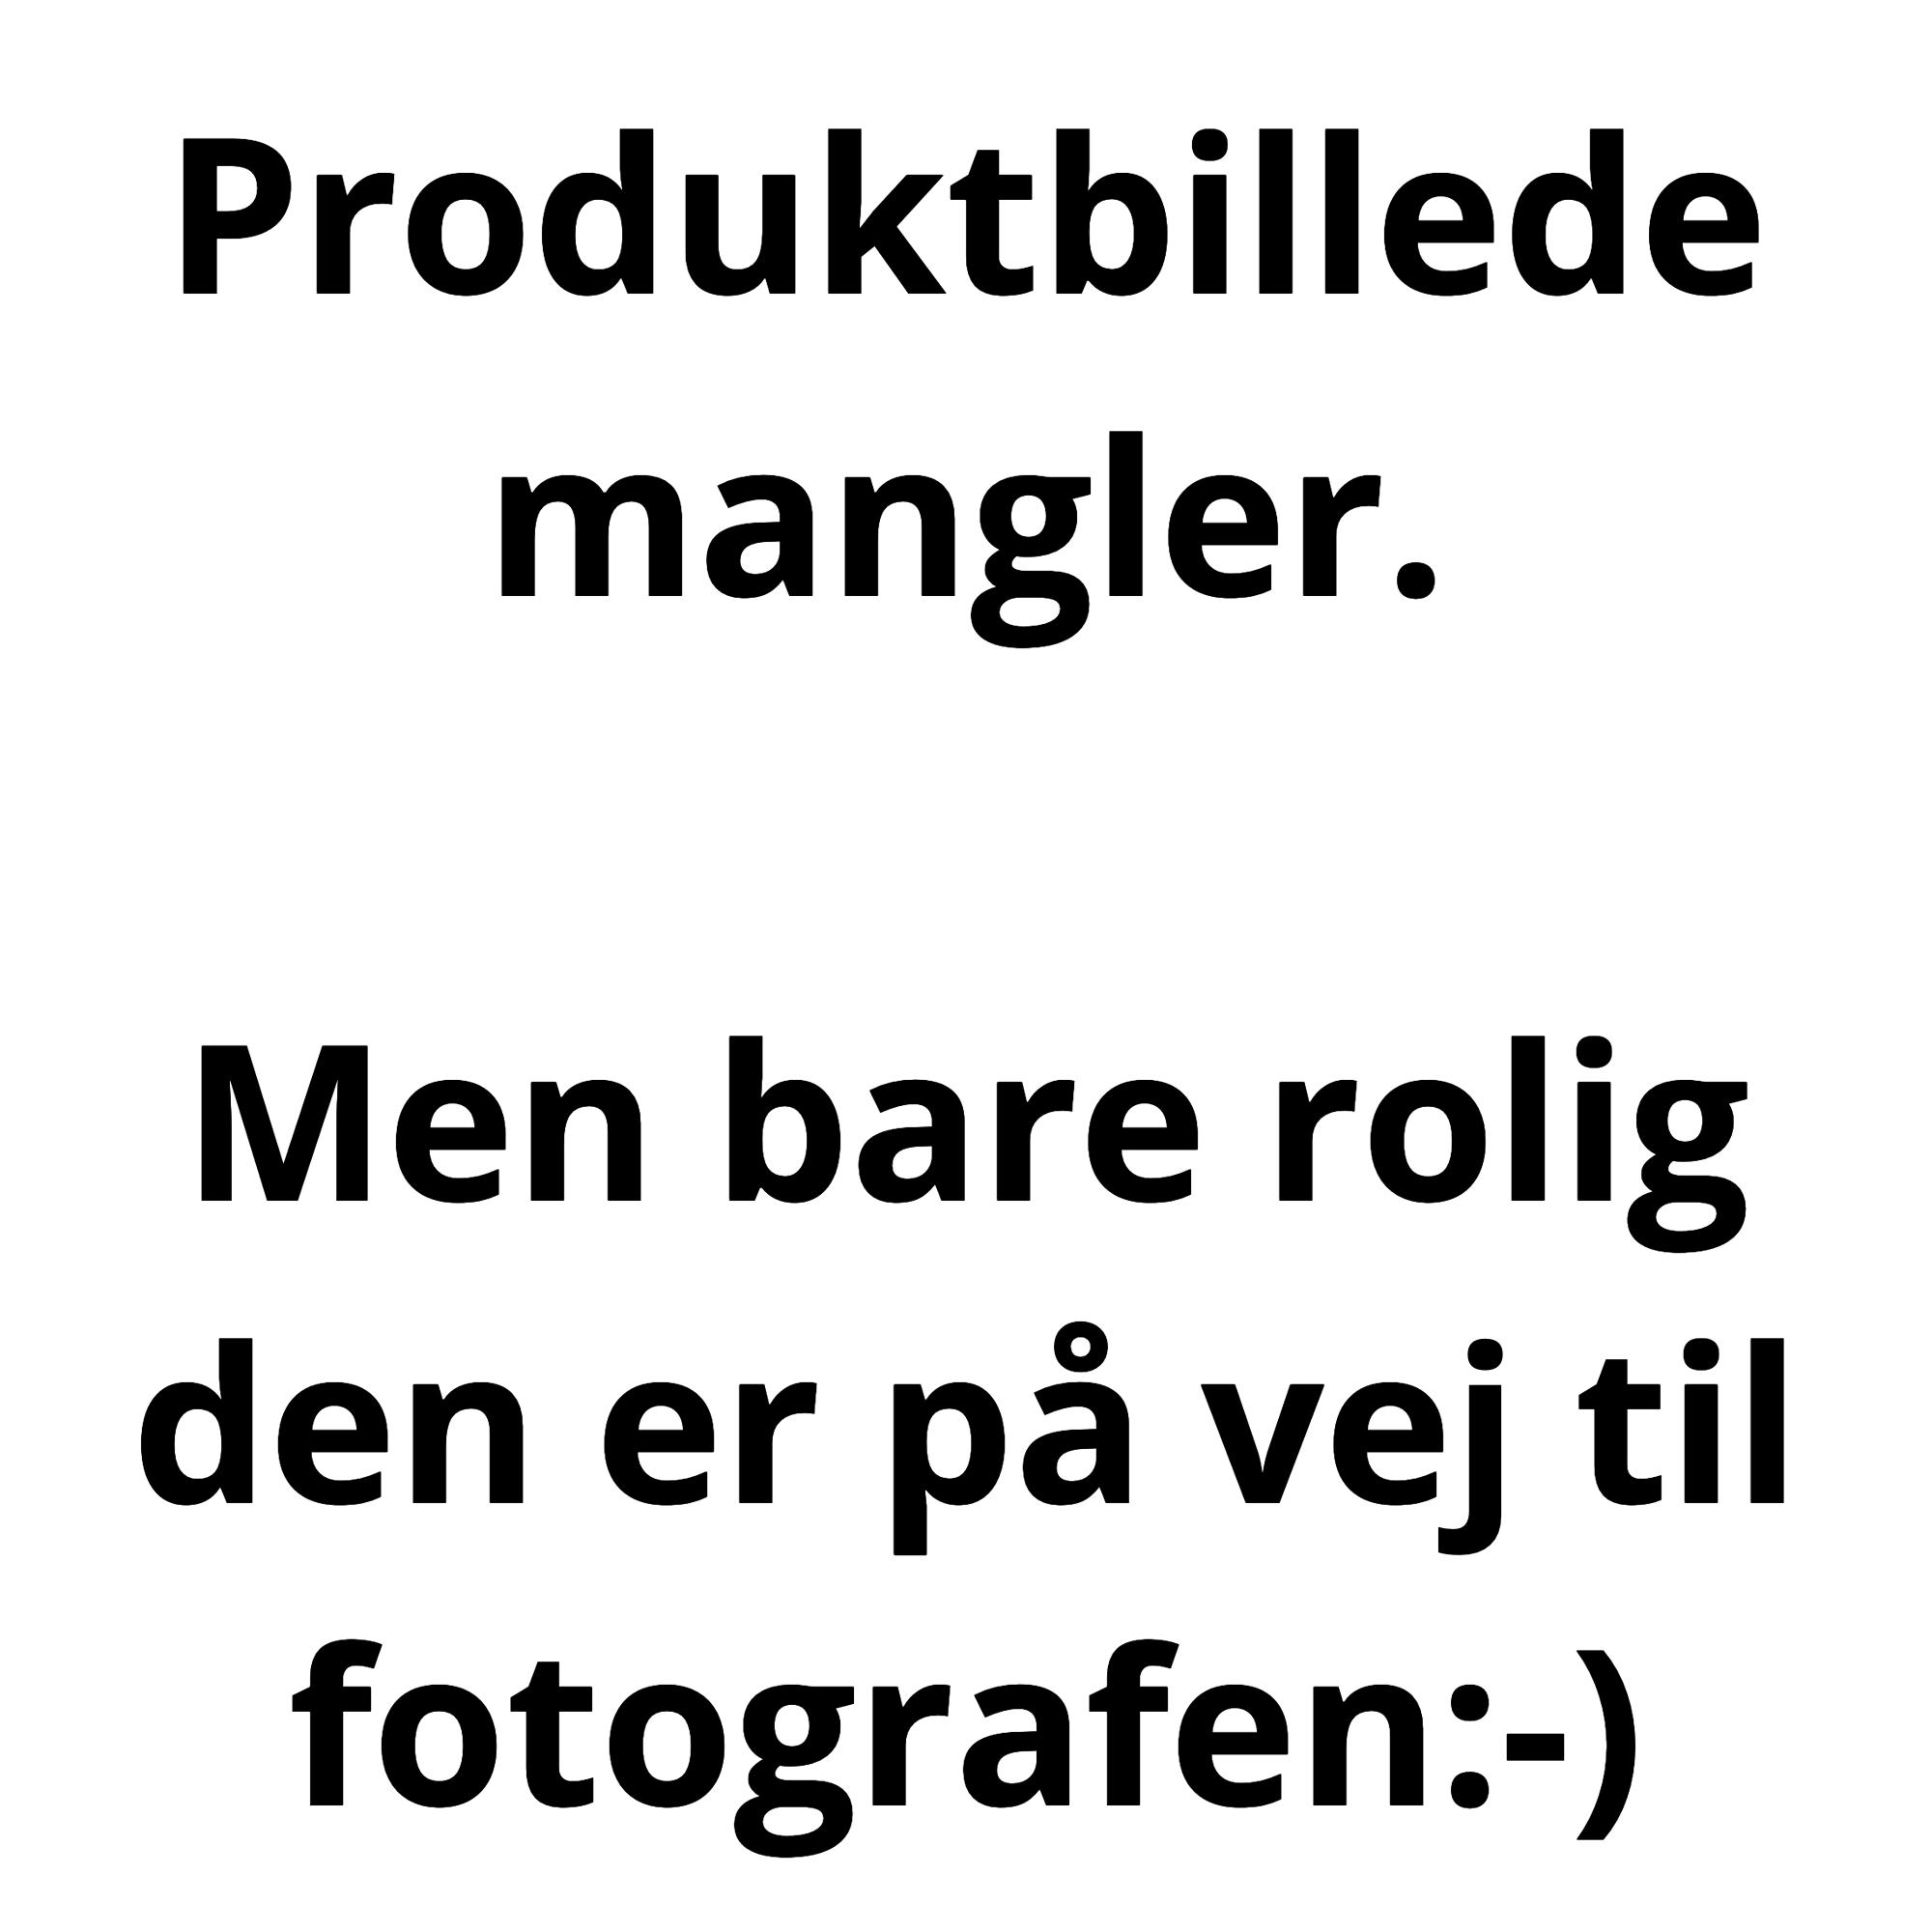 Brodit Huawei P20 m. beskyttelsescover B:70-83 D:2-10  - Faststrøms Holder